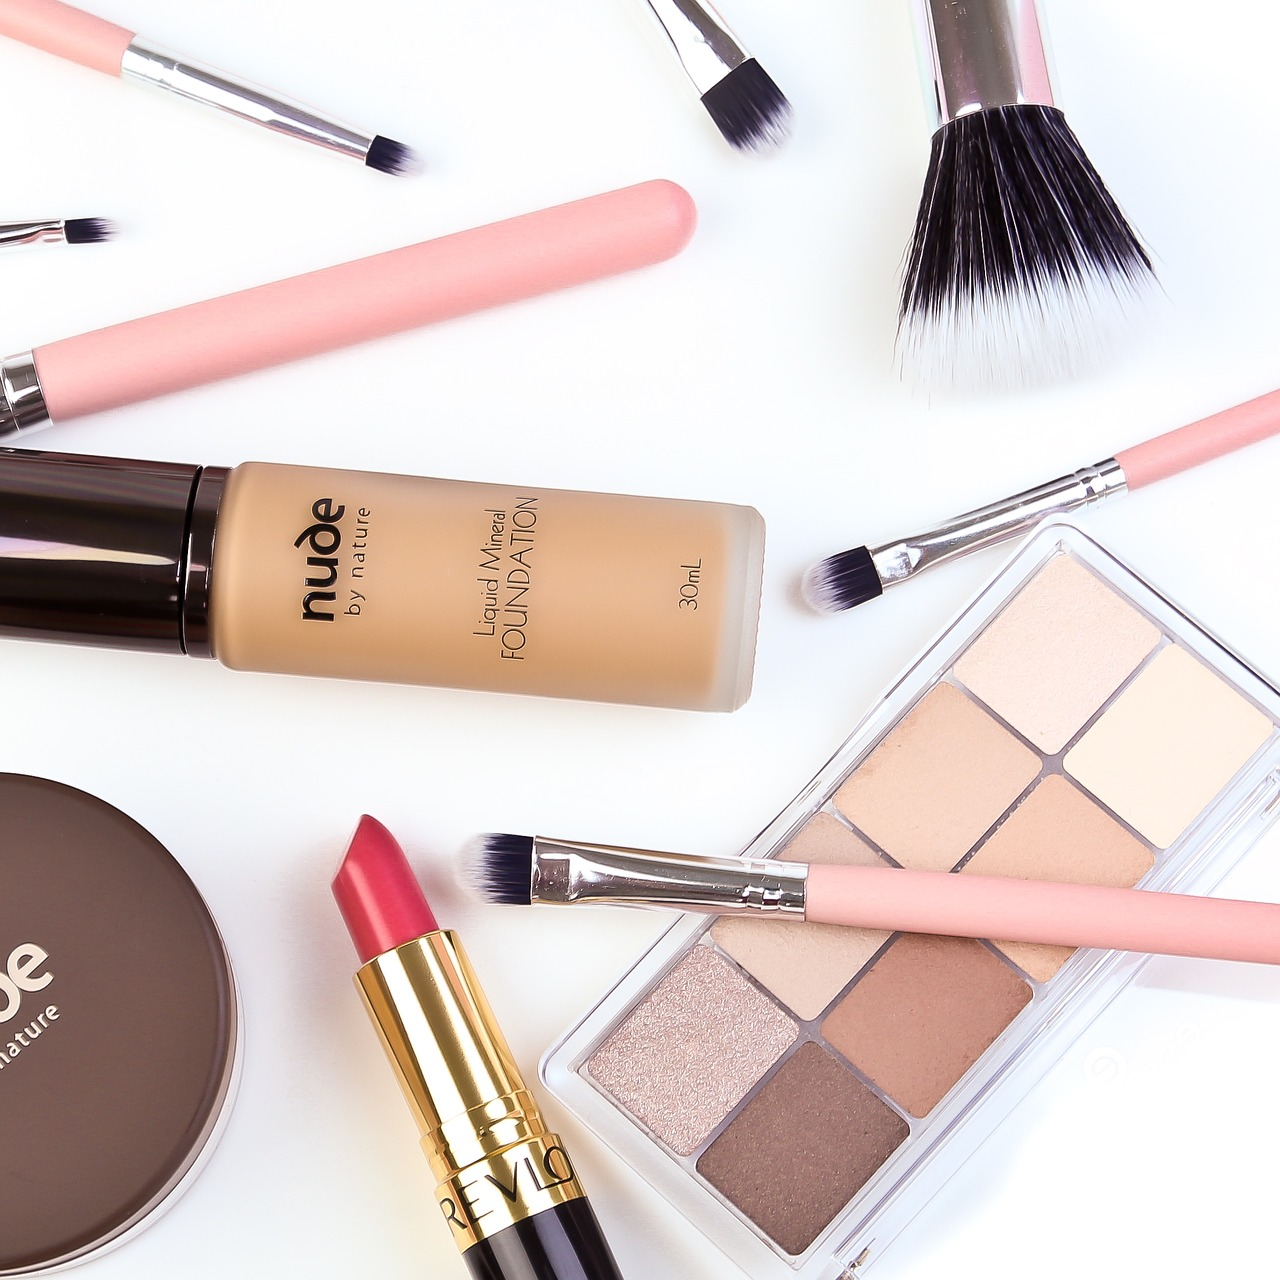 Marketing drugs and cosmetics